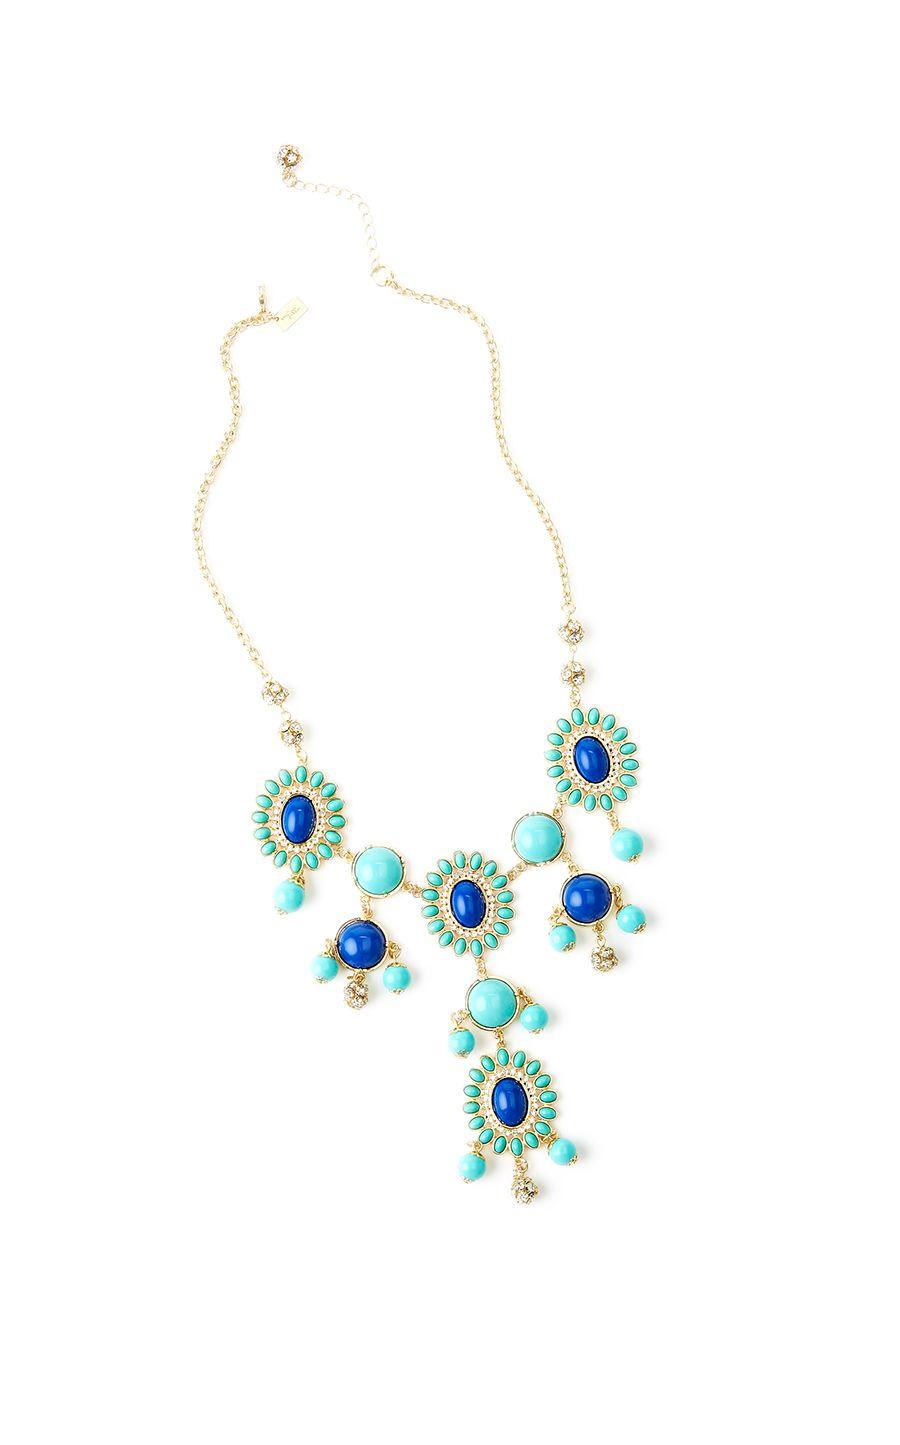 Dew Drop Necklace in Sapphire Blue